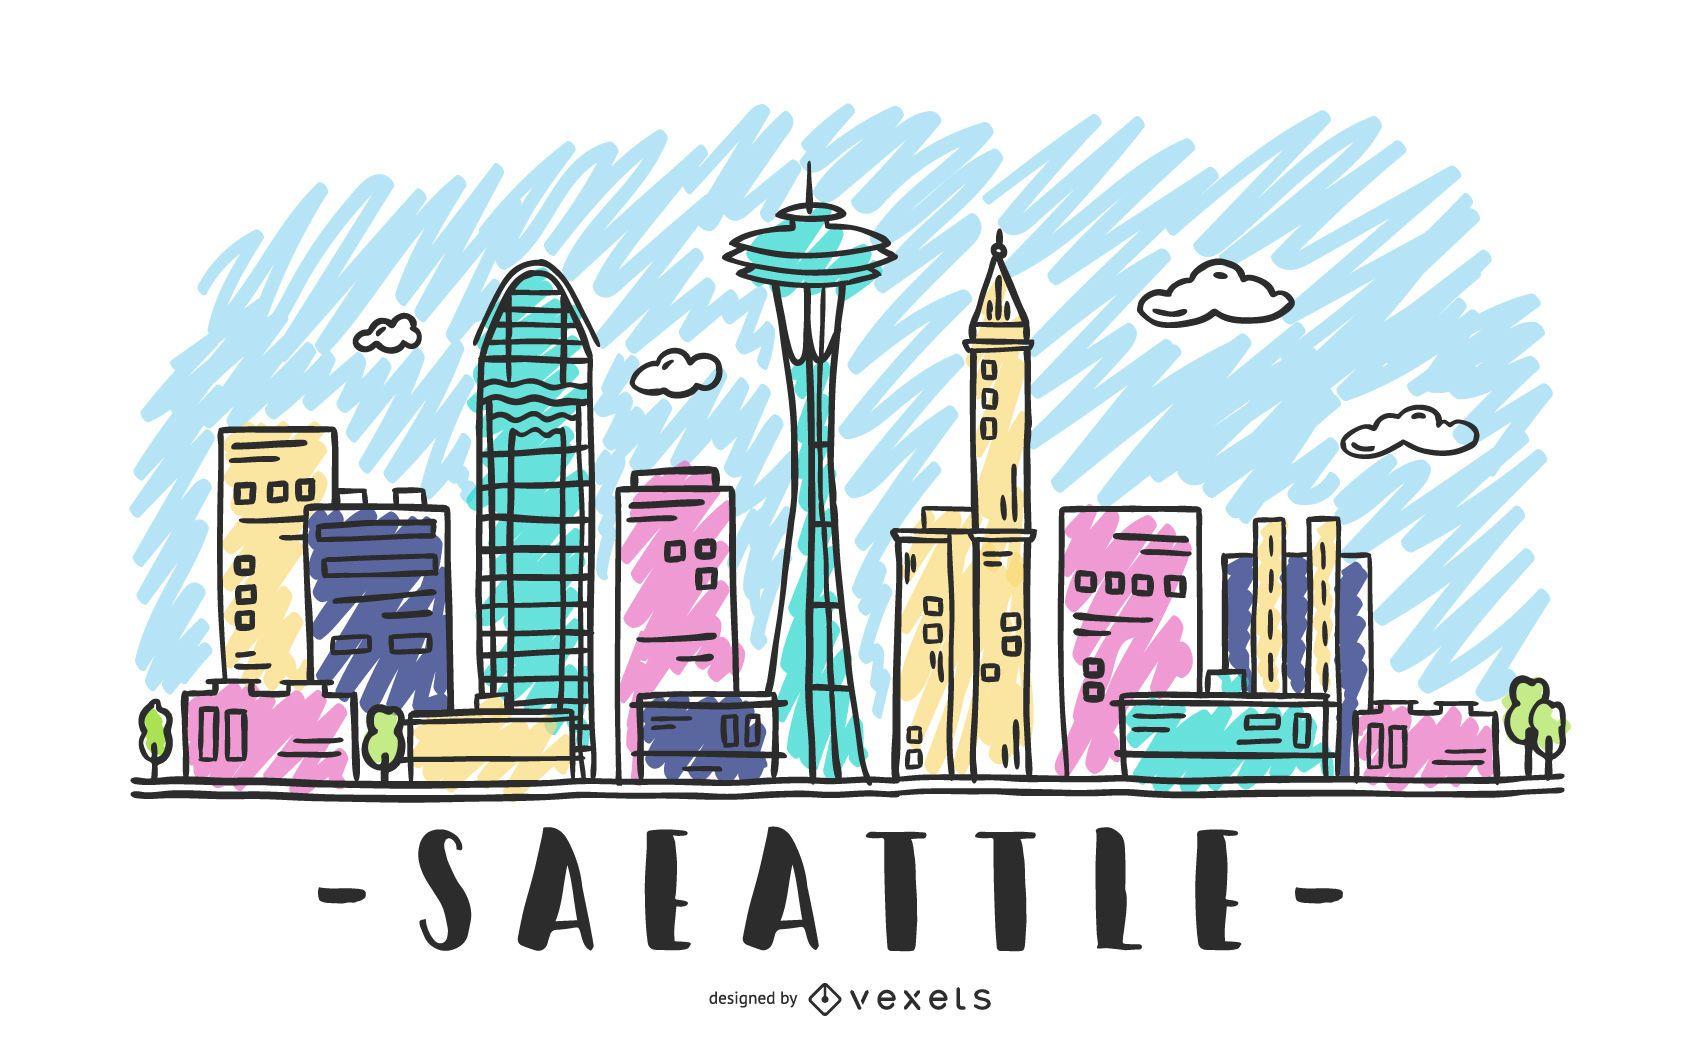 Dise?o del horizonte de Seattle